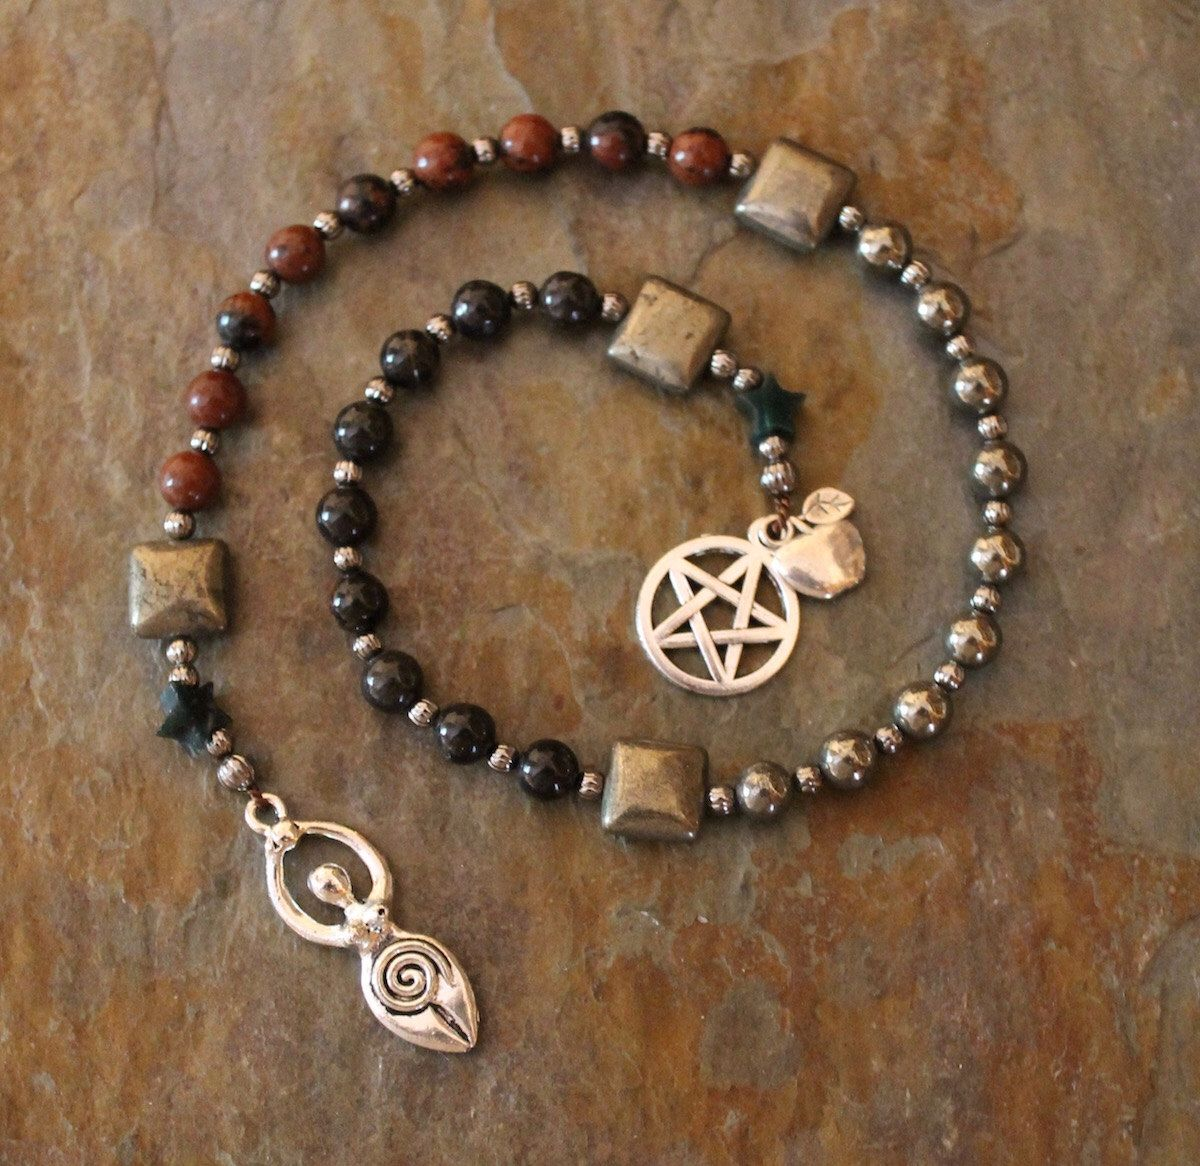 Mabon Autumn Equinox, Pagan Prayer Beads, Witches Ladder